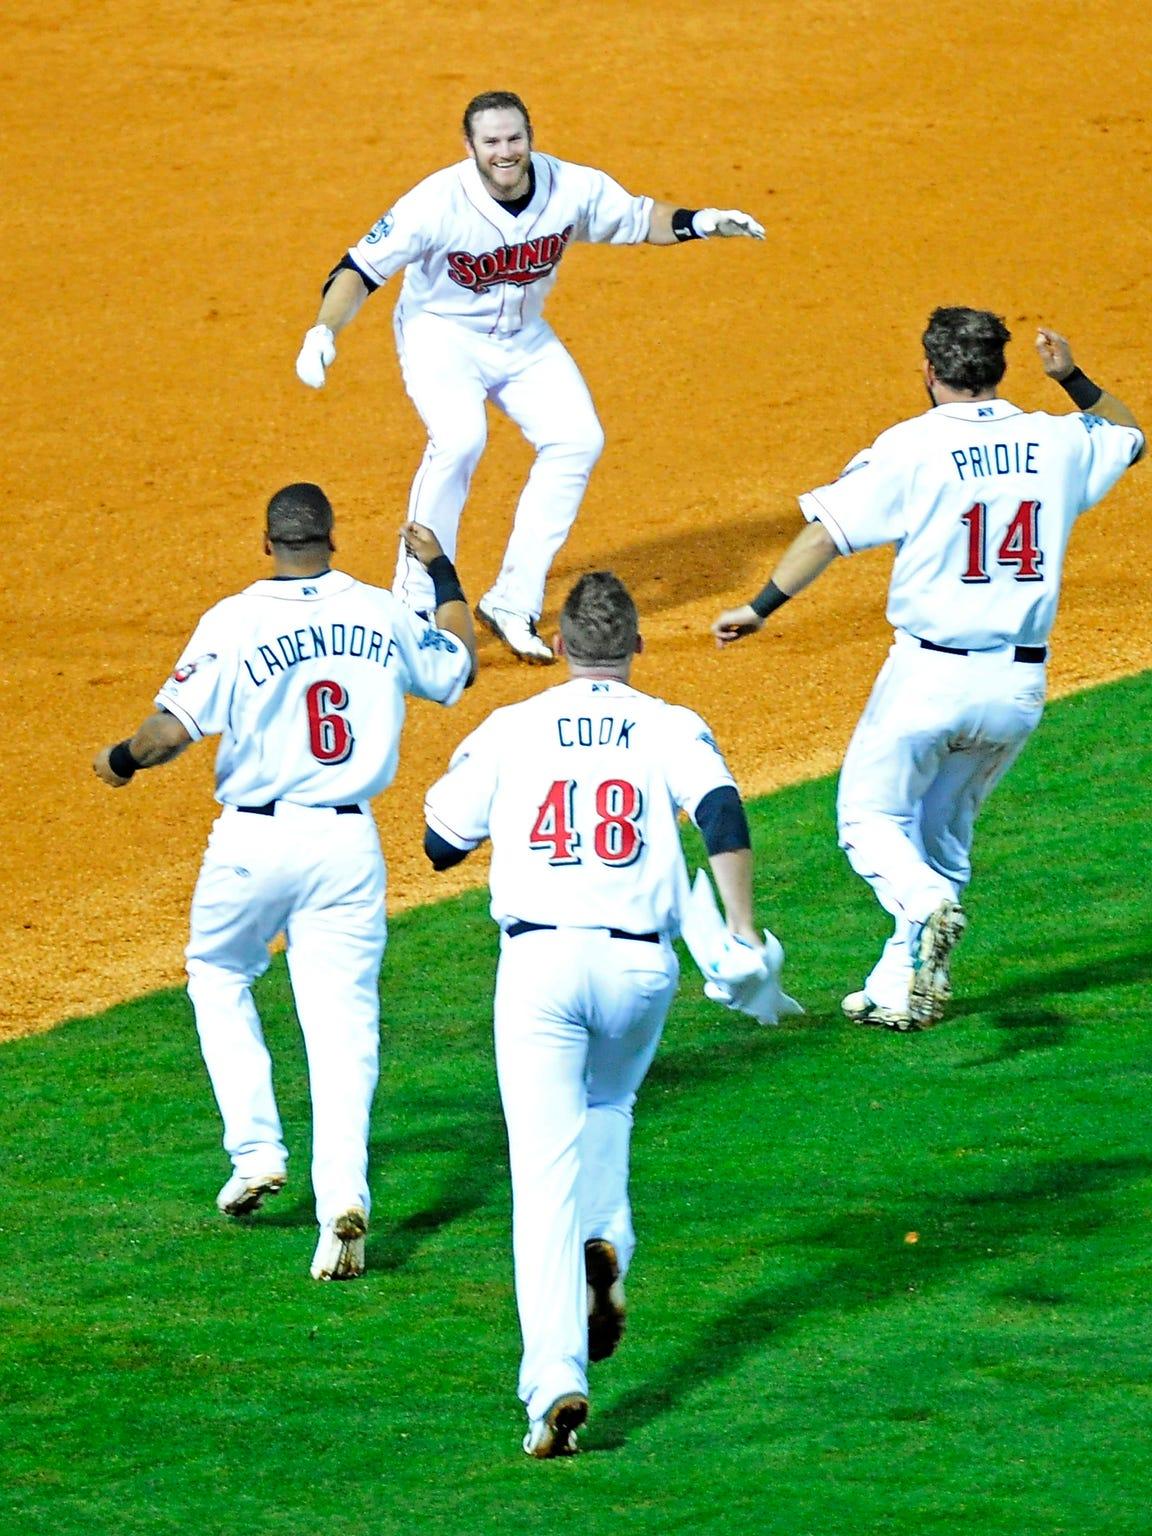 Max Muncy, top, celebrates with his teammates Jason